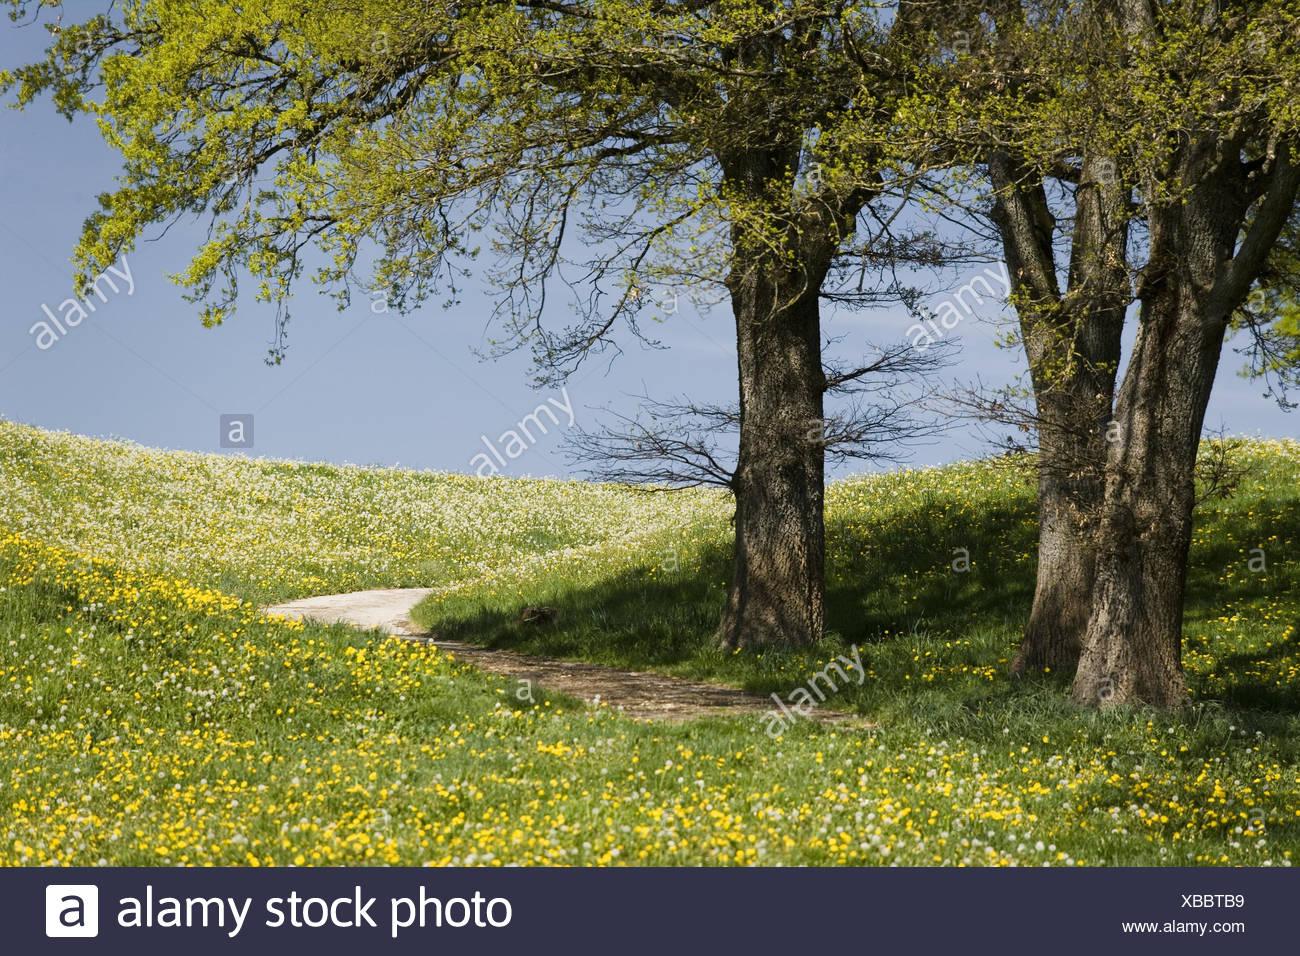 Flower Meadow Country Lane Oaks Detail Spring Hill Scenery